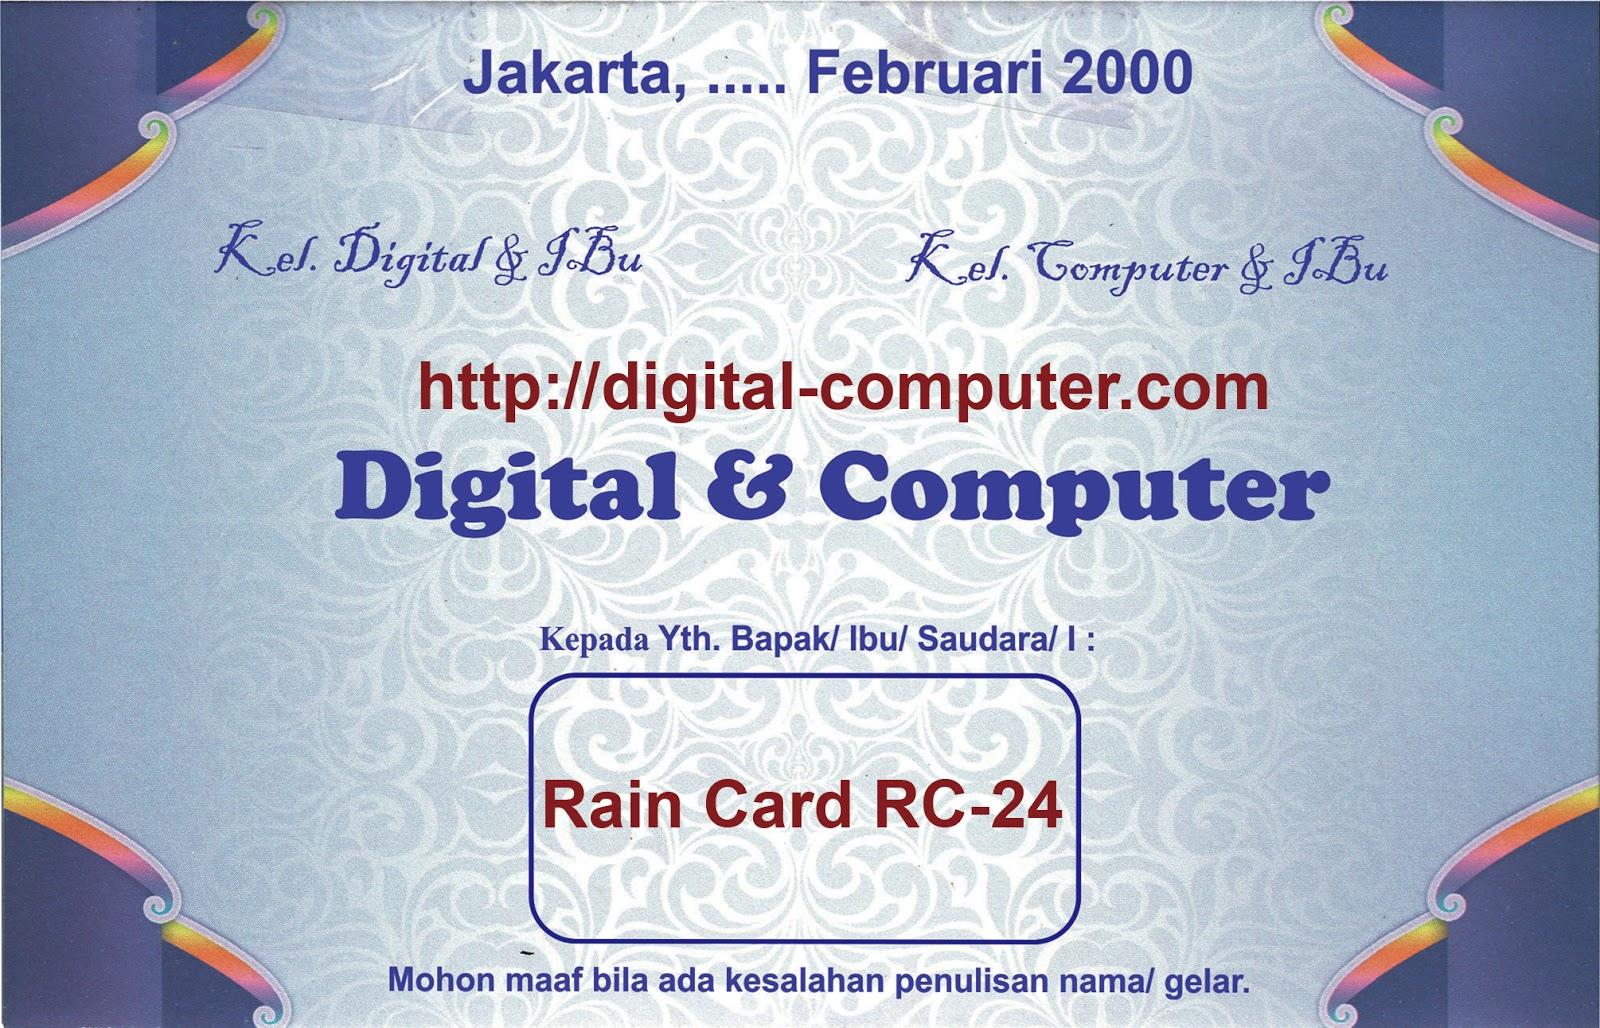 Undangan Softcover Rain Card RC-24